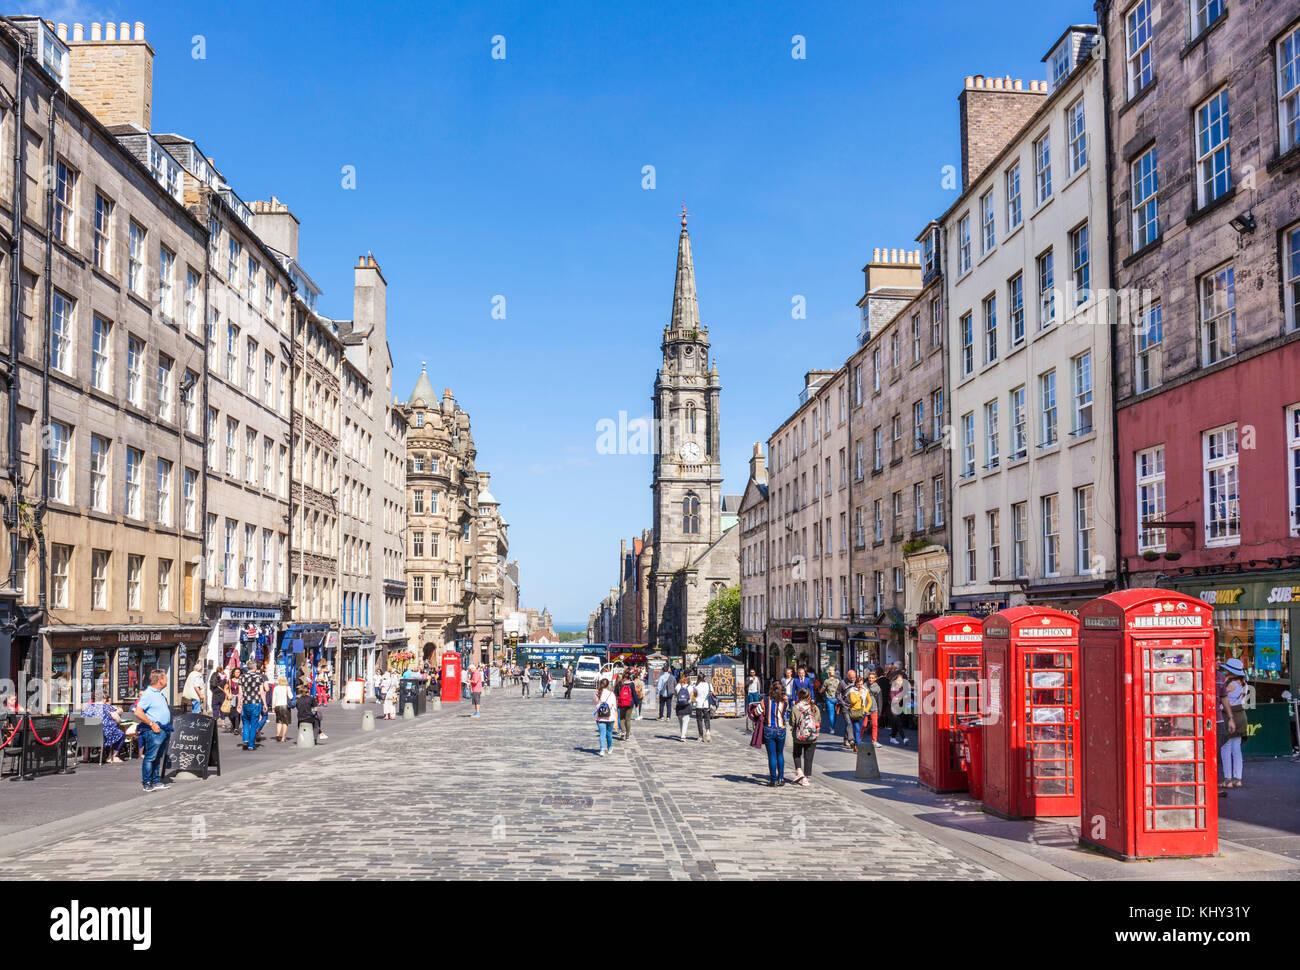 royal Mile edinburgh scotland edinburgh The High Street ...